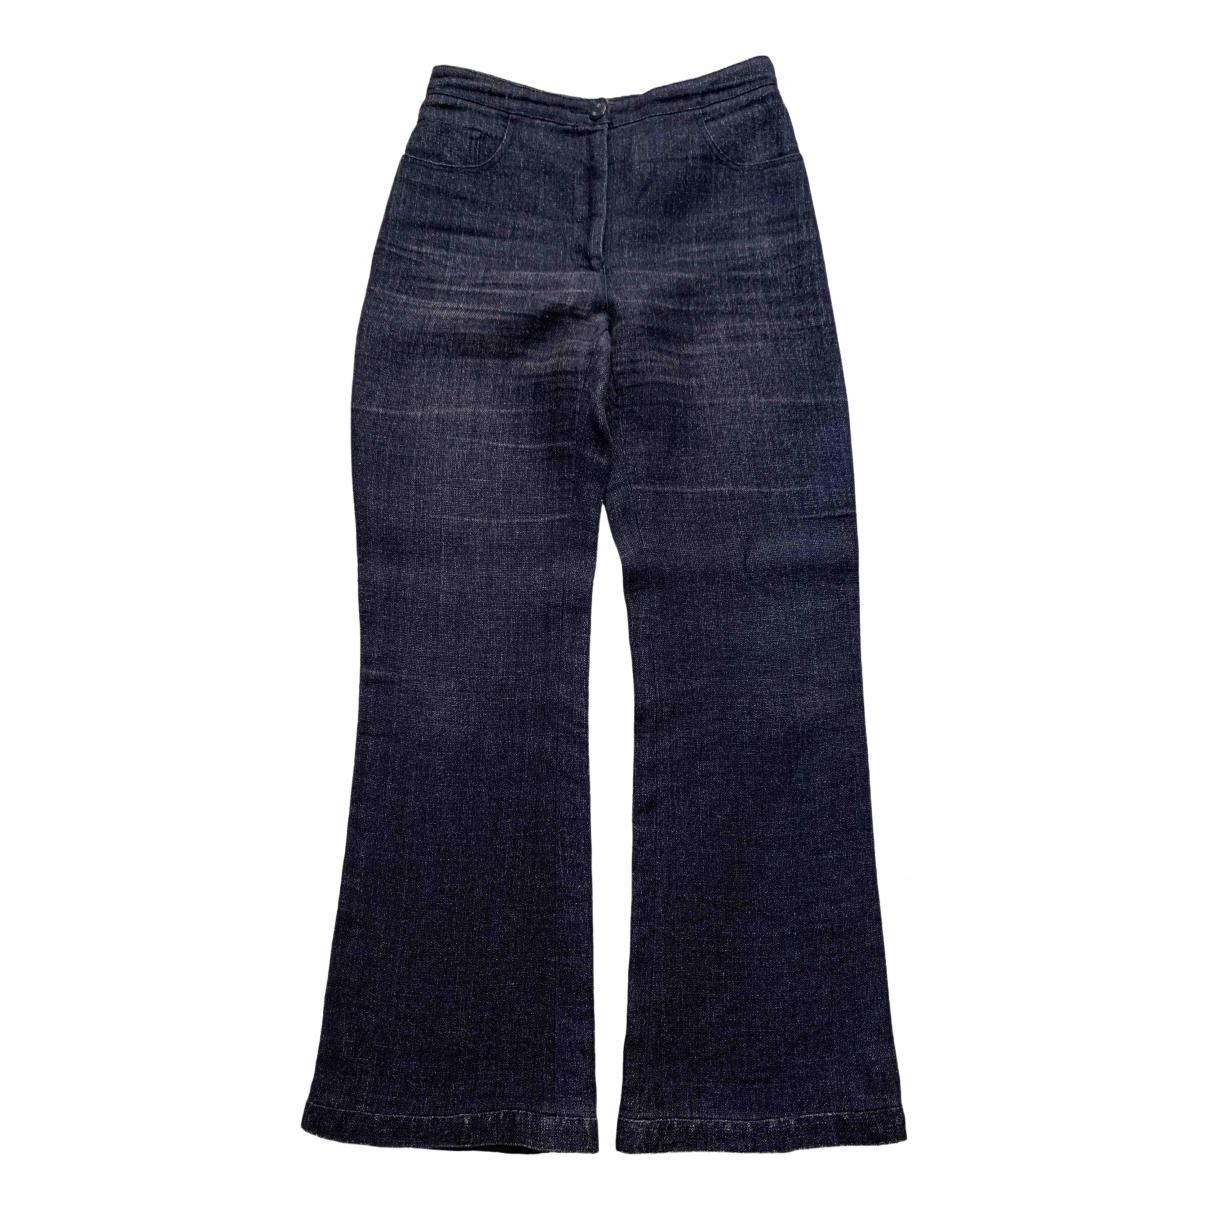 Chanel \N Navy Linen Trousers for Women 38 FR